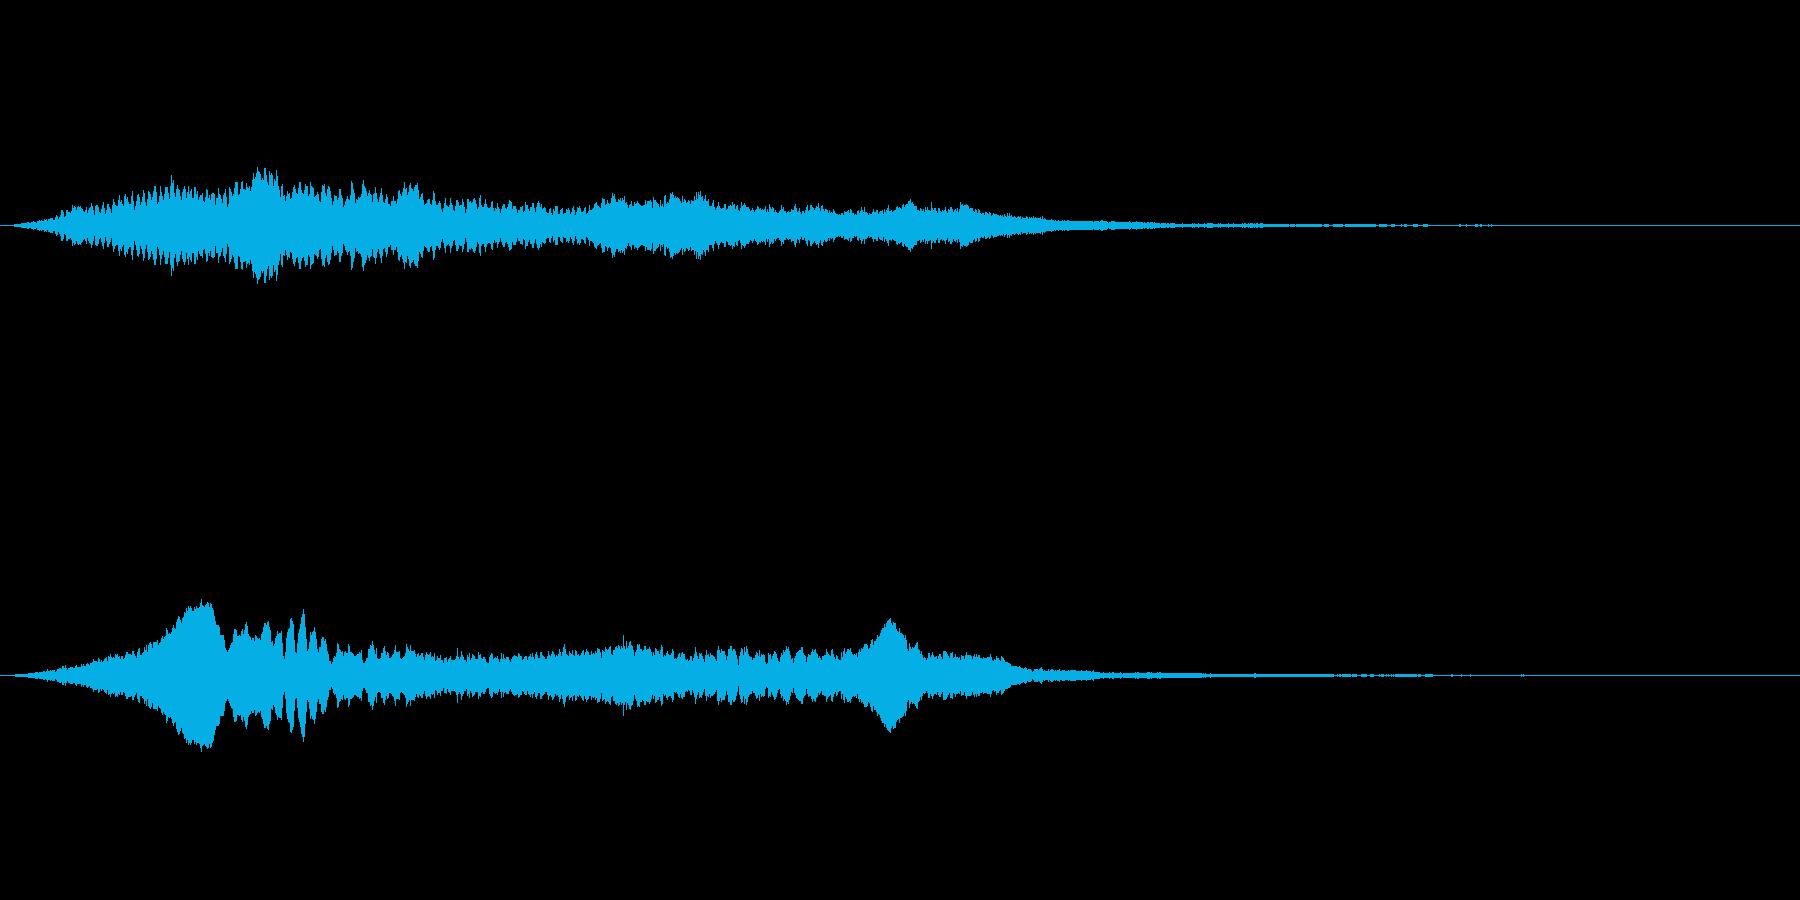 Horror 恐怖煽る金切りホラーノイズの再生済みの波形